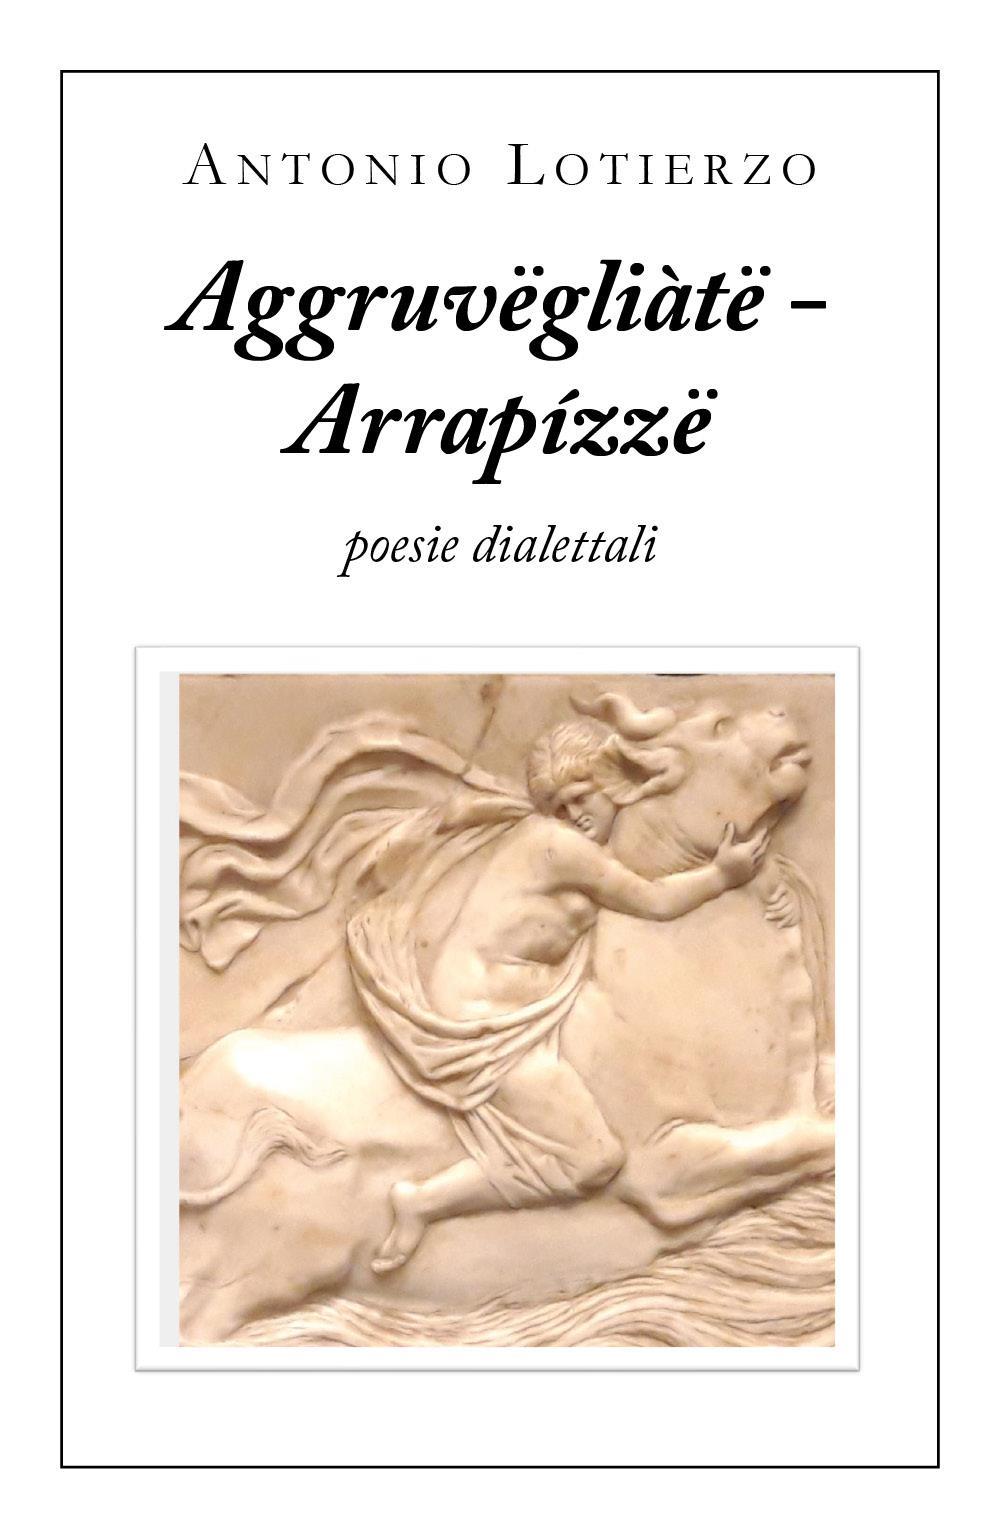 Aggruvëgliàtë - Arrapízzë